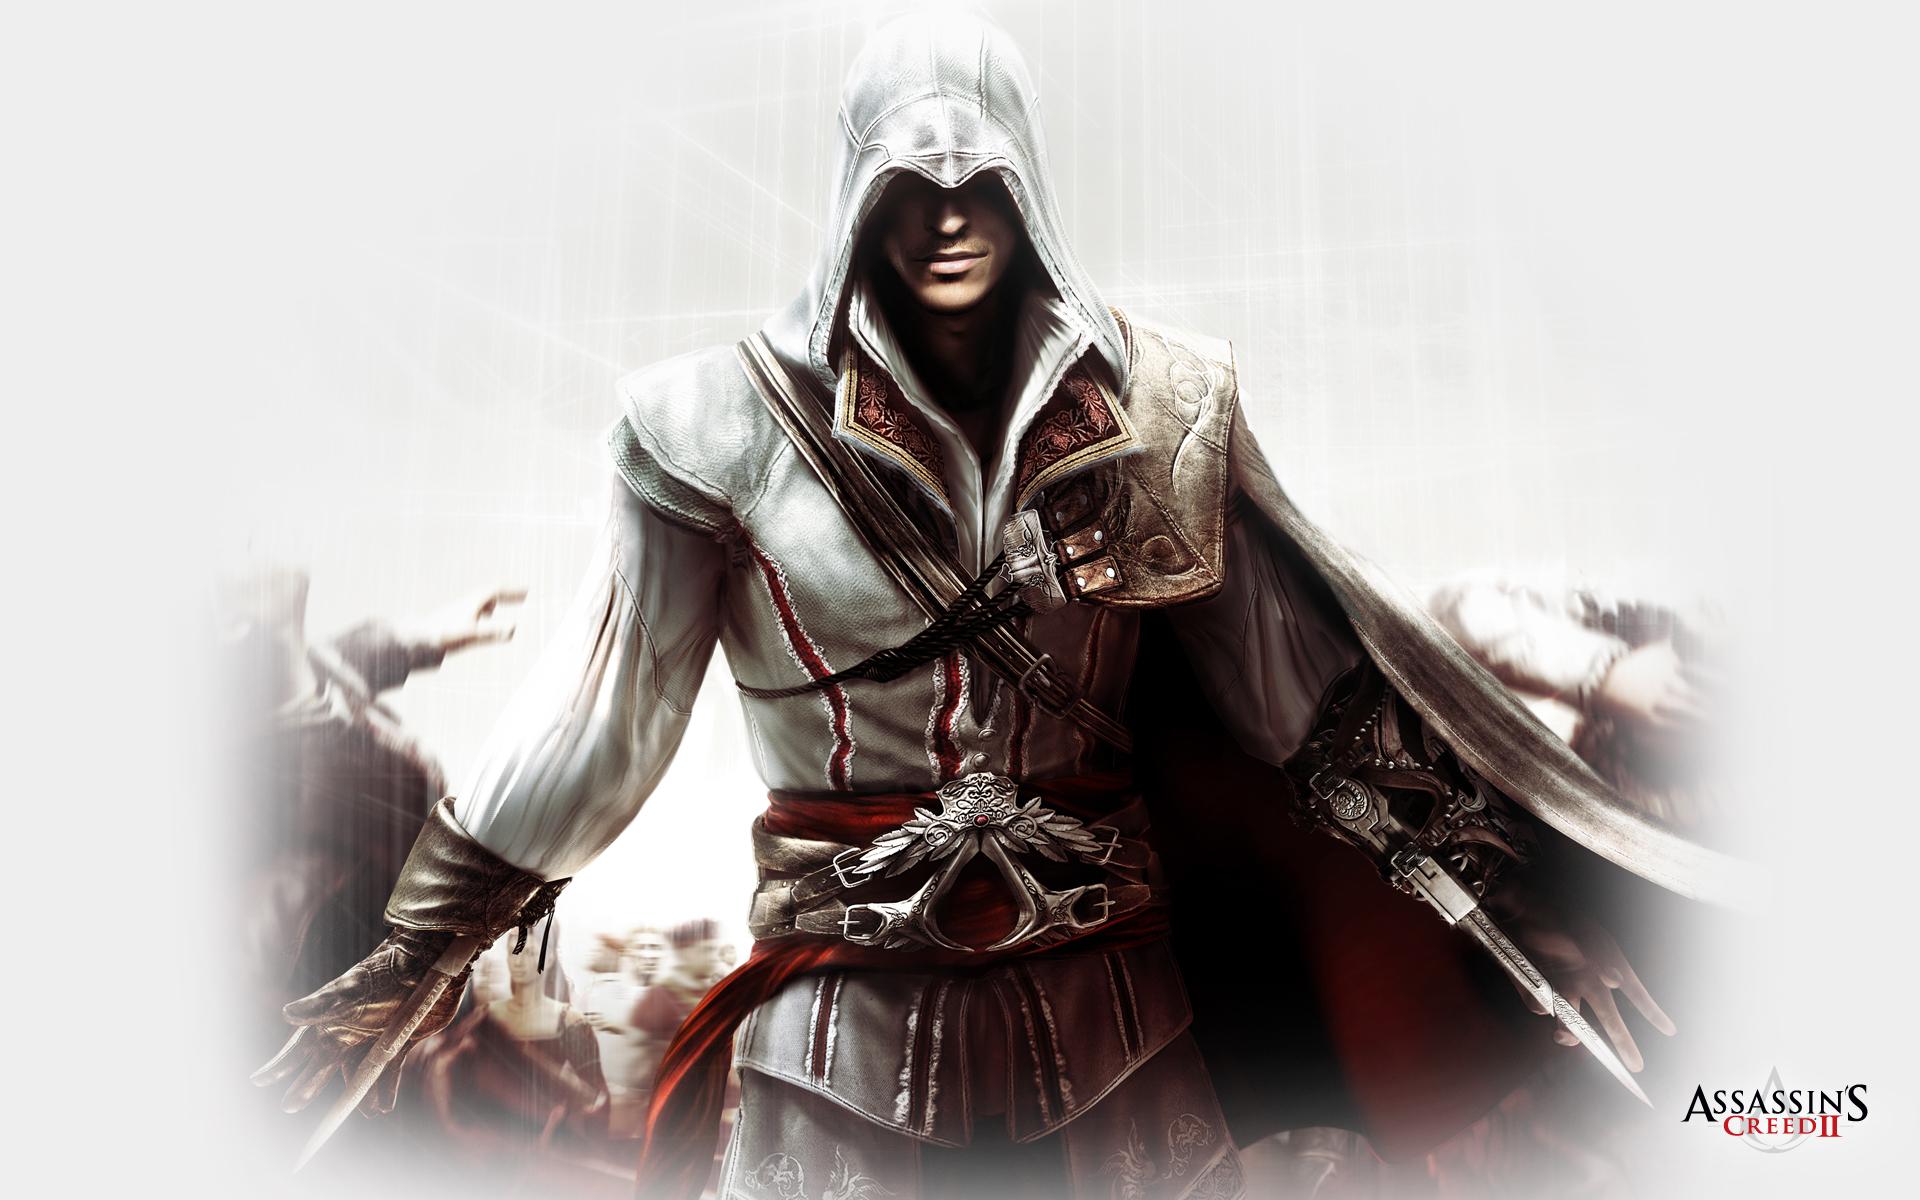 Assassins Creed Brotherhood Wallpaper Wallpaper Full HD 1080p 1920x1200